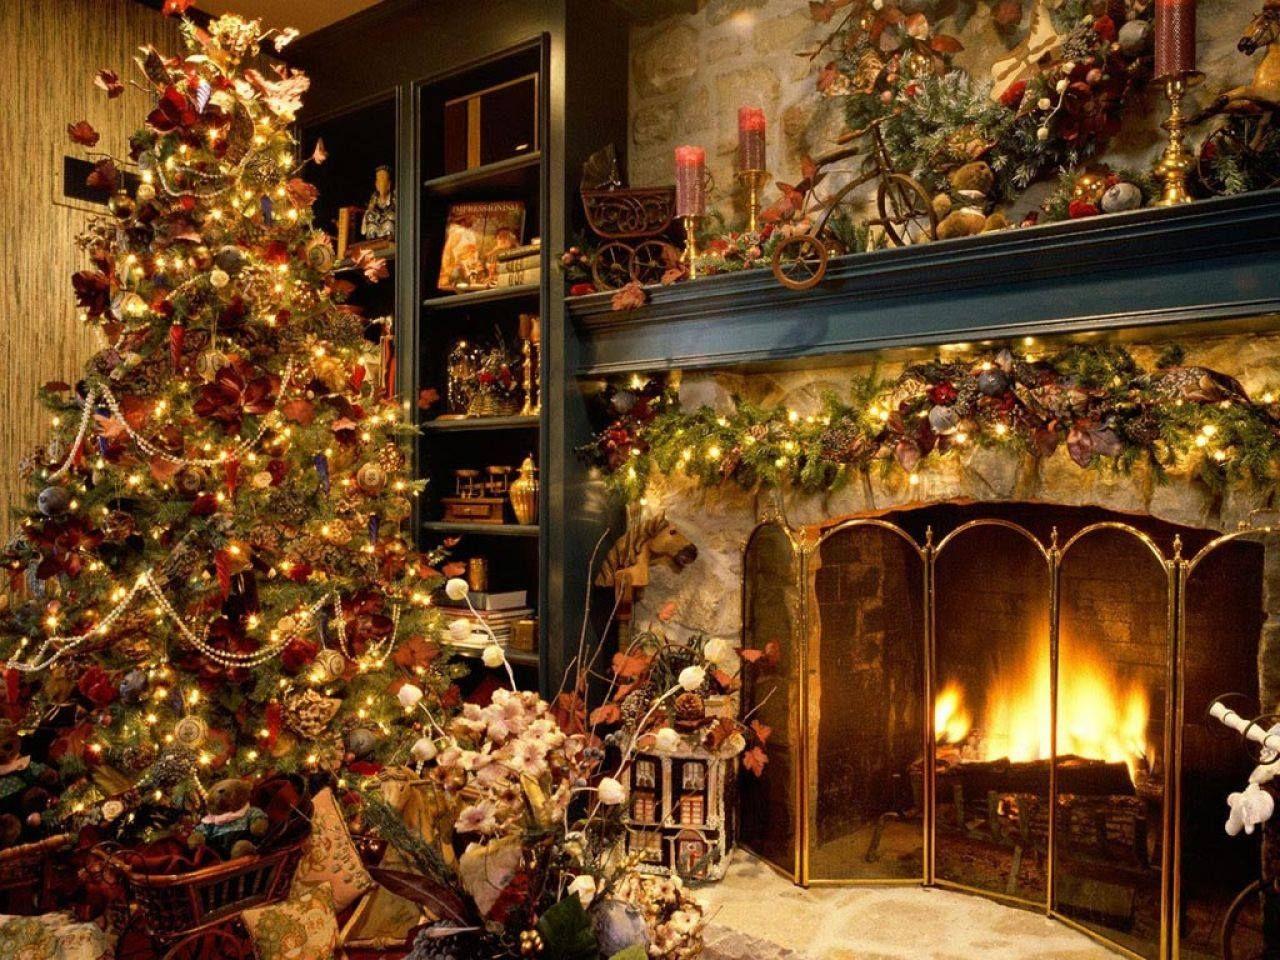 chimeneas navideñas - Buscar con Google